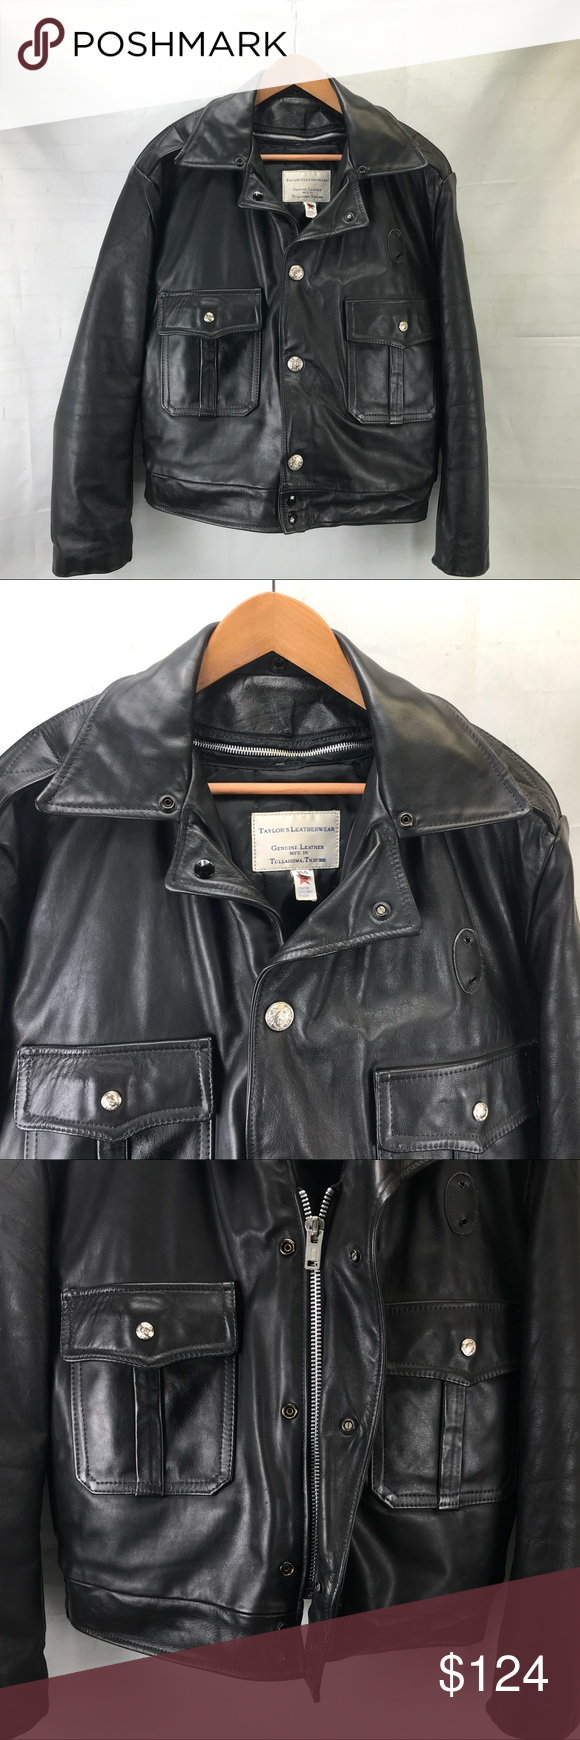 Taylors Leatherwear Police Leather Heavy Jacket Heavy